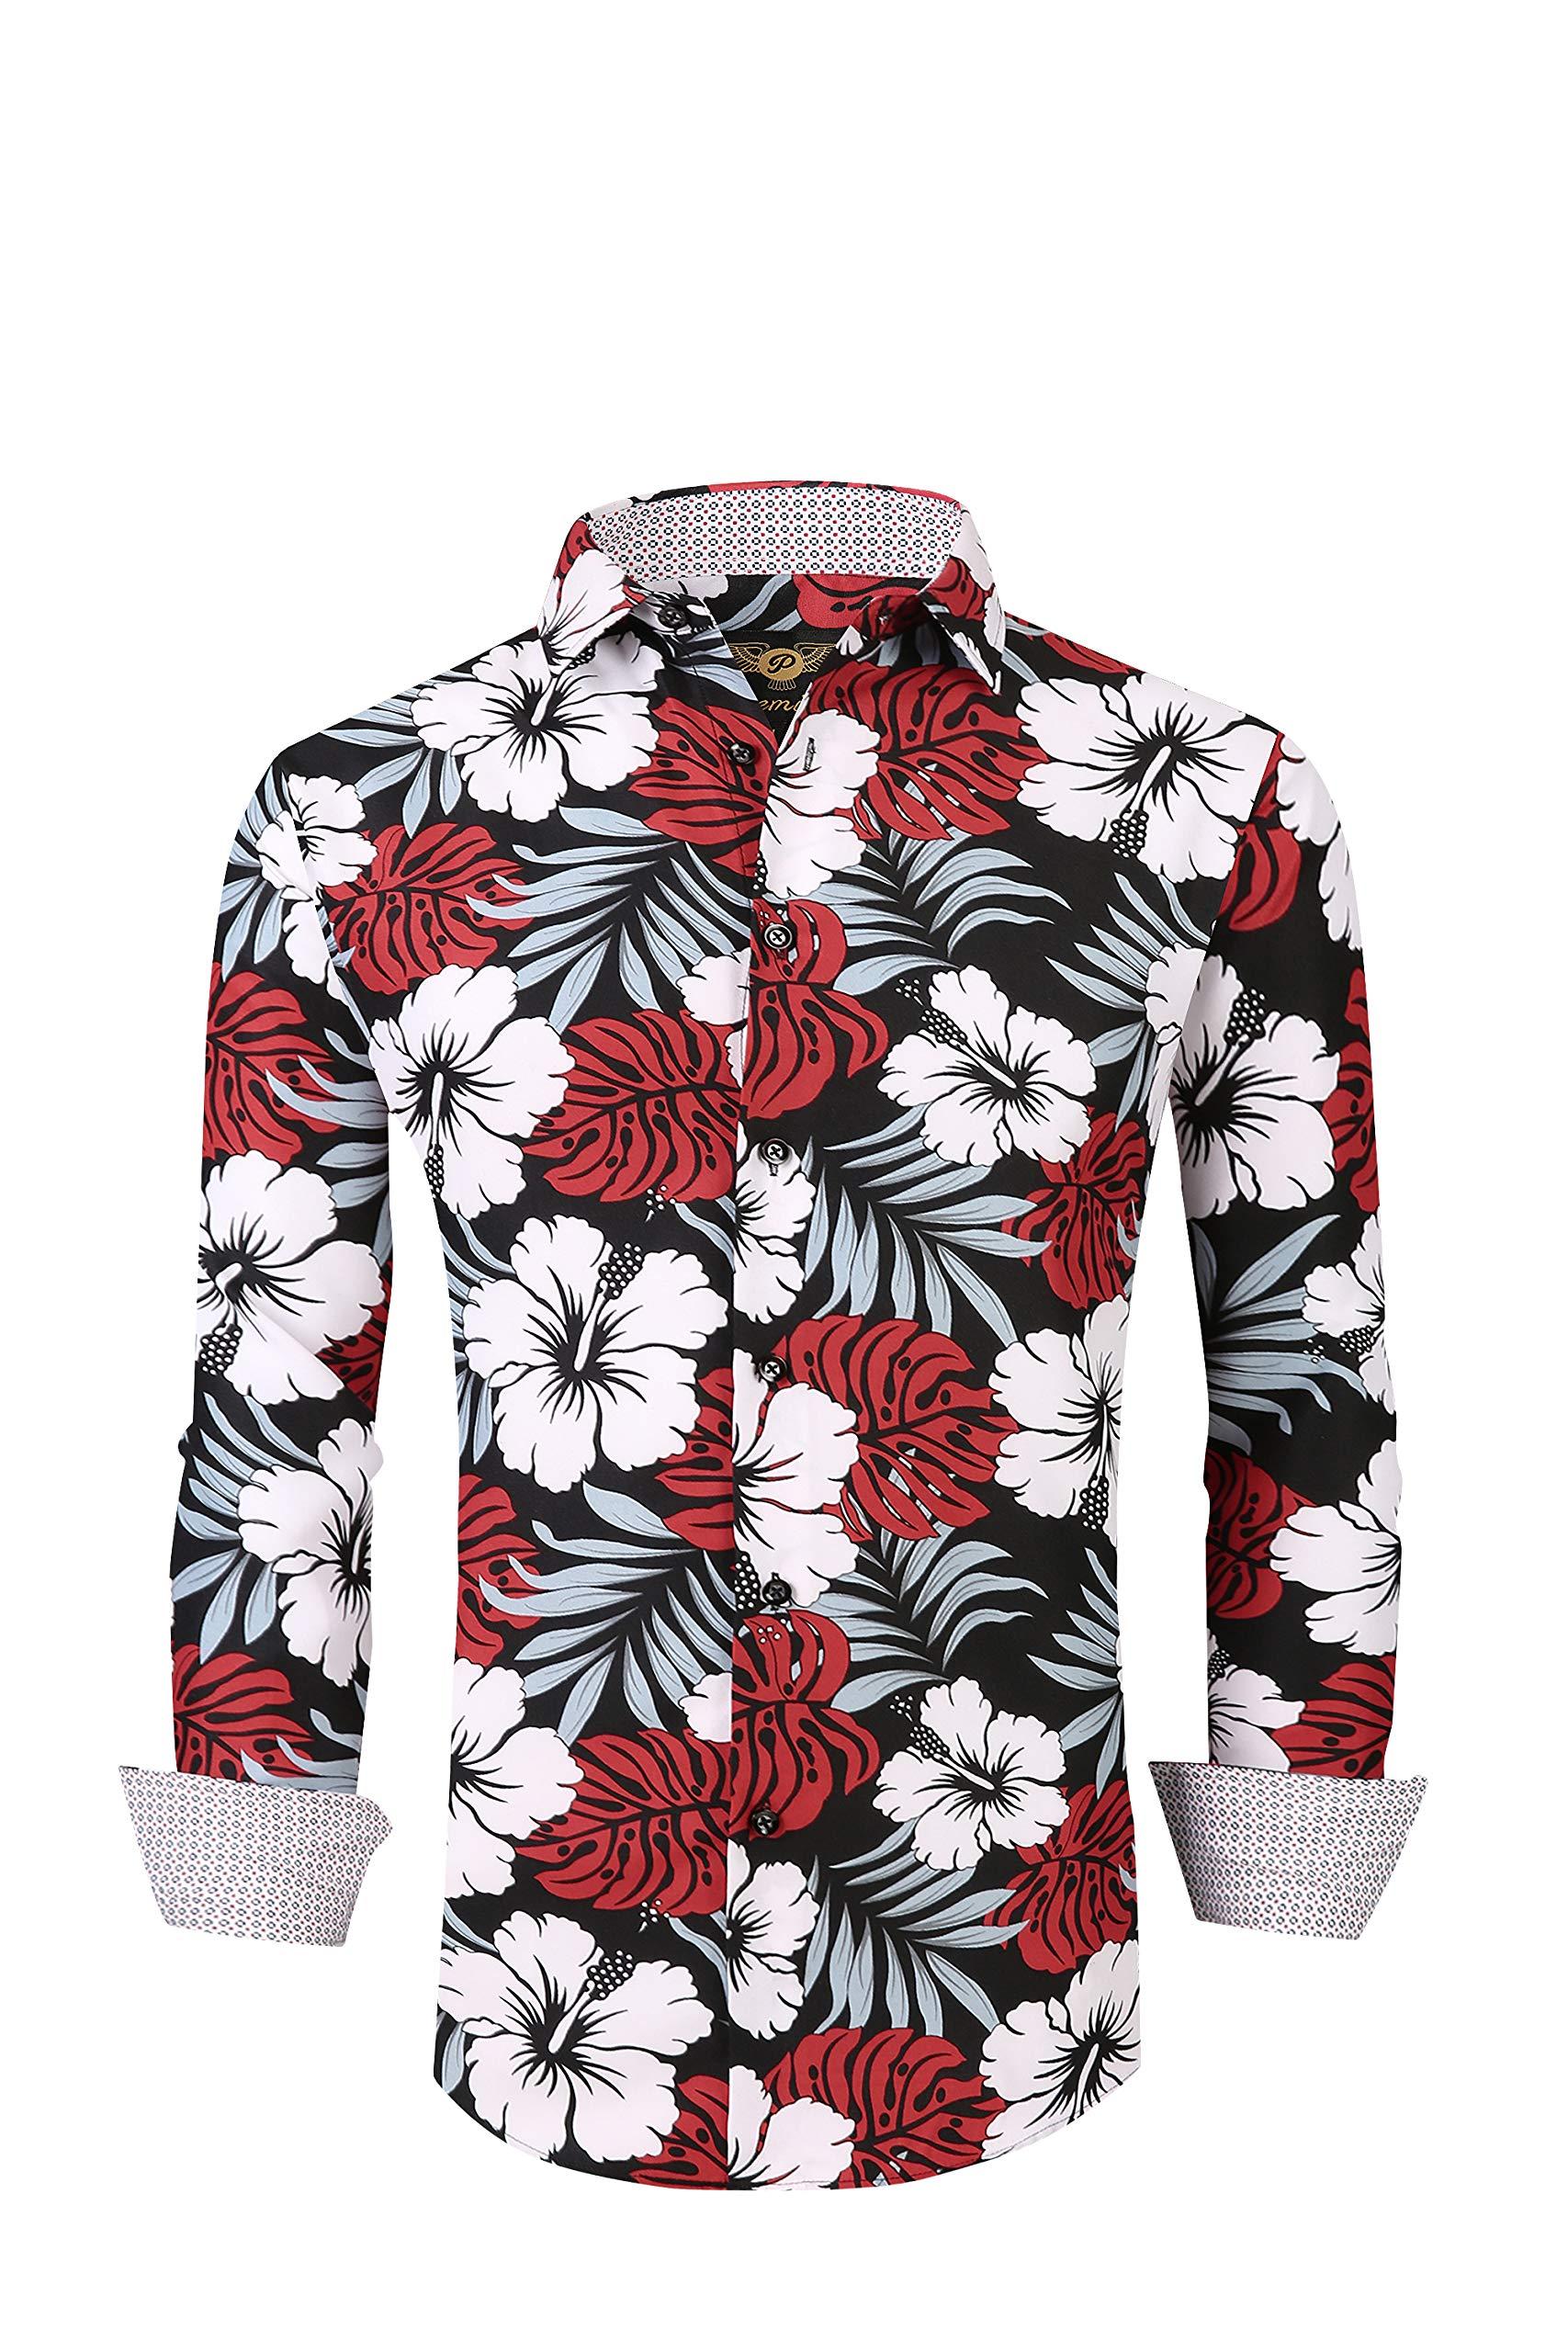 Flash Apparel Premiere Men Floral Dress Shirts Long Sleeve Casual Button Down Flower Hawaiian Printed Shirts (3XL, Black Red White 689)